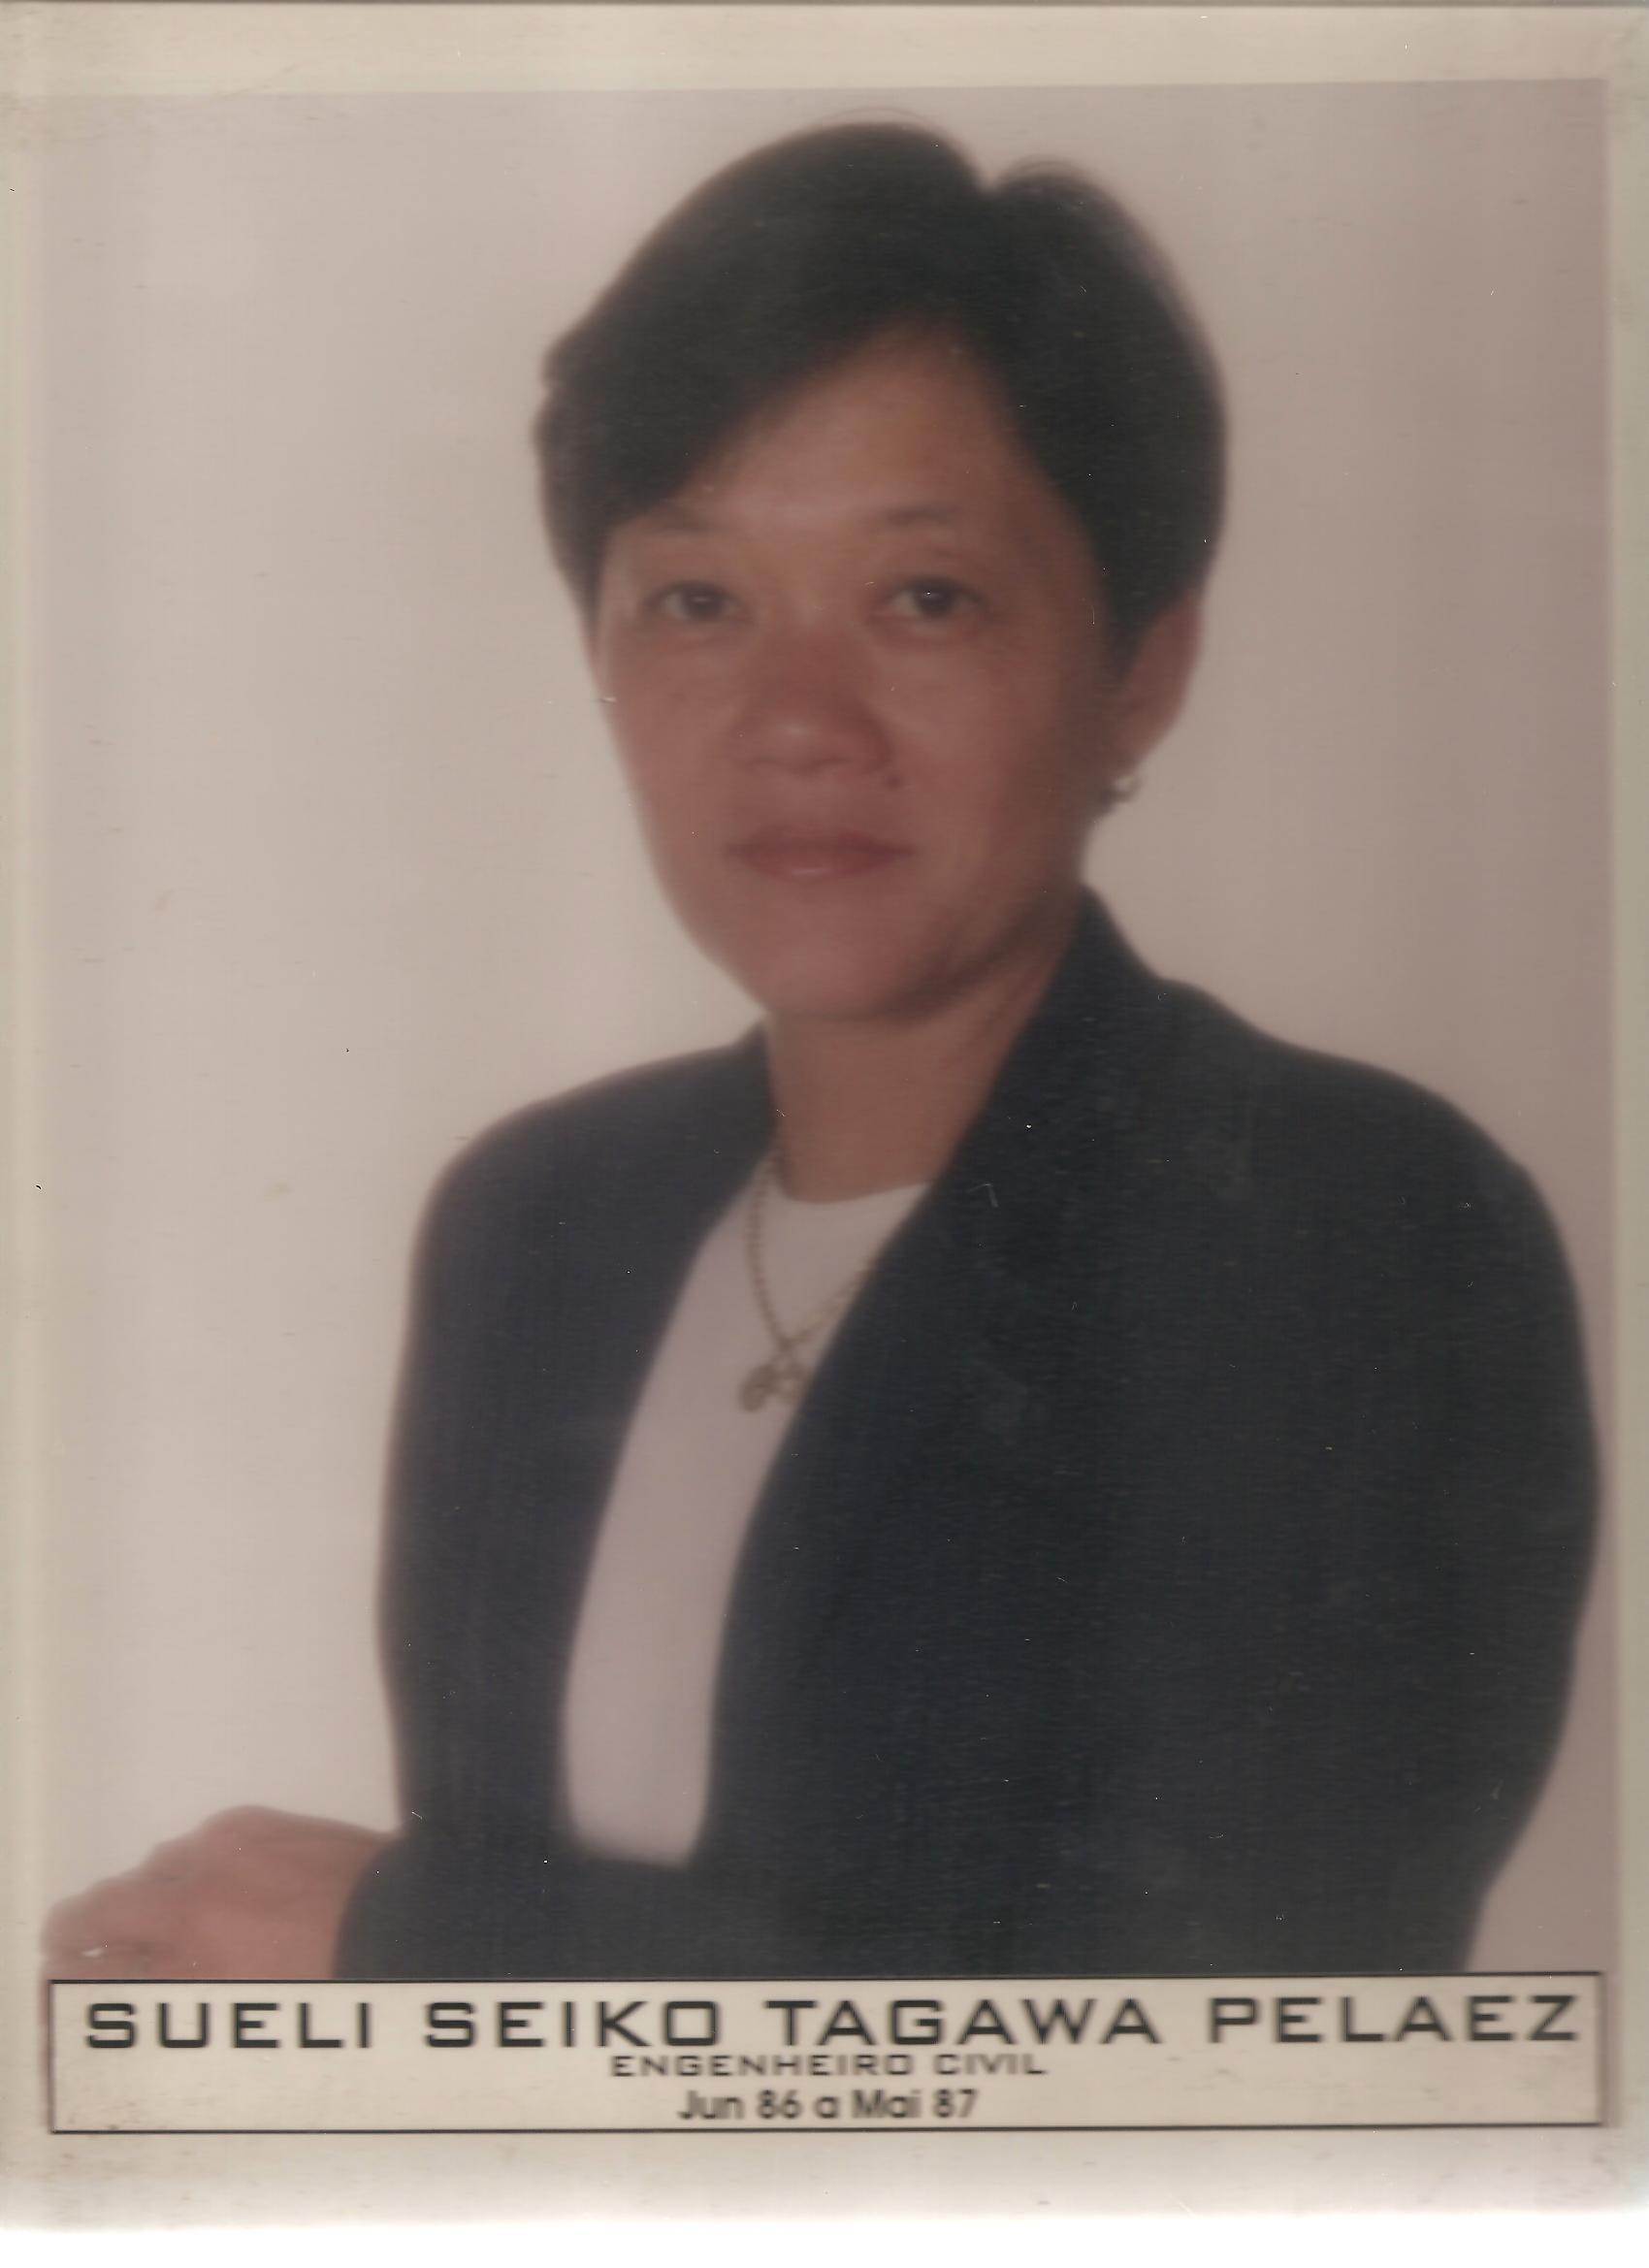 Sueli Seiko Tagawa Pelaez